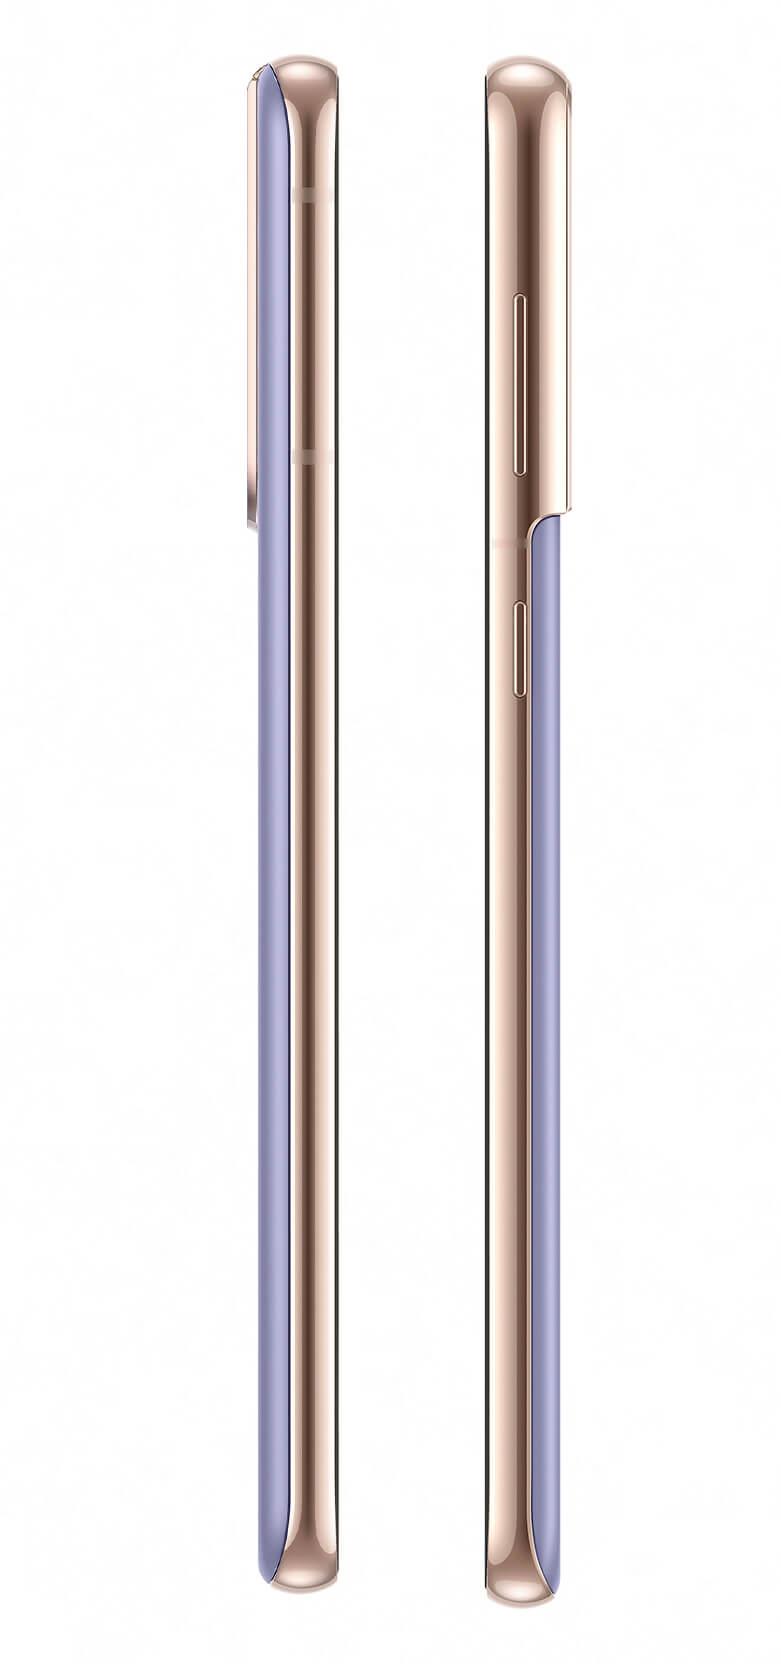 Samsung Galaxy S21 Phantom Violet 8GB RAM |256GB